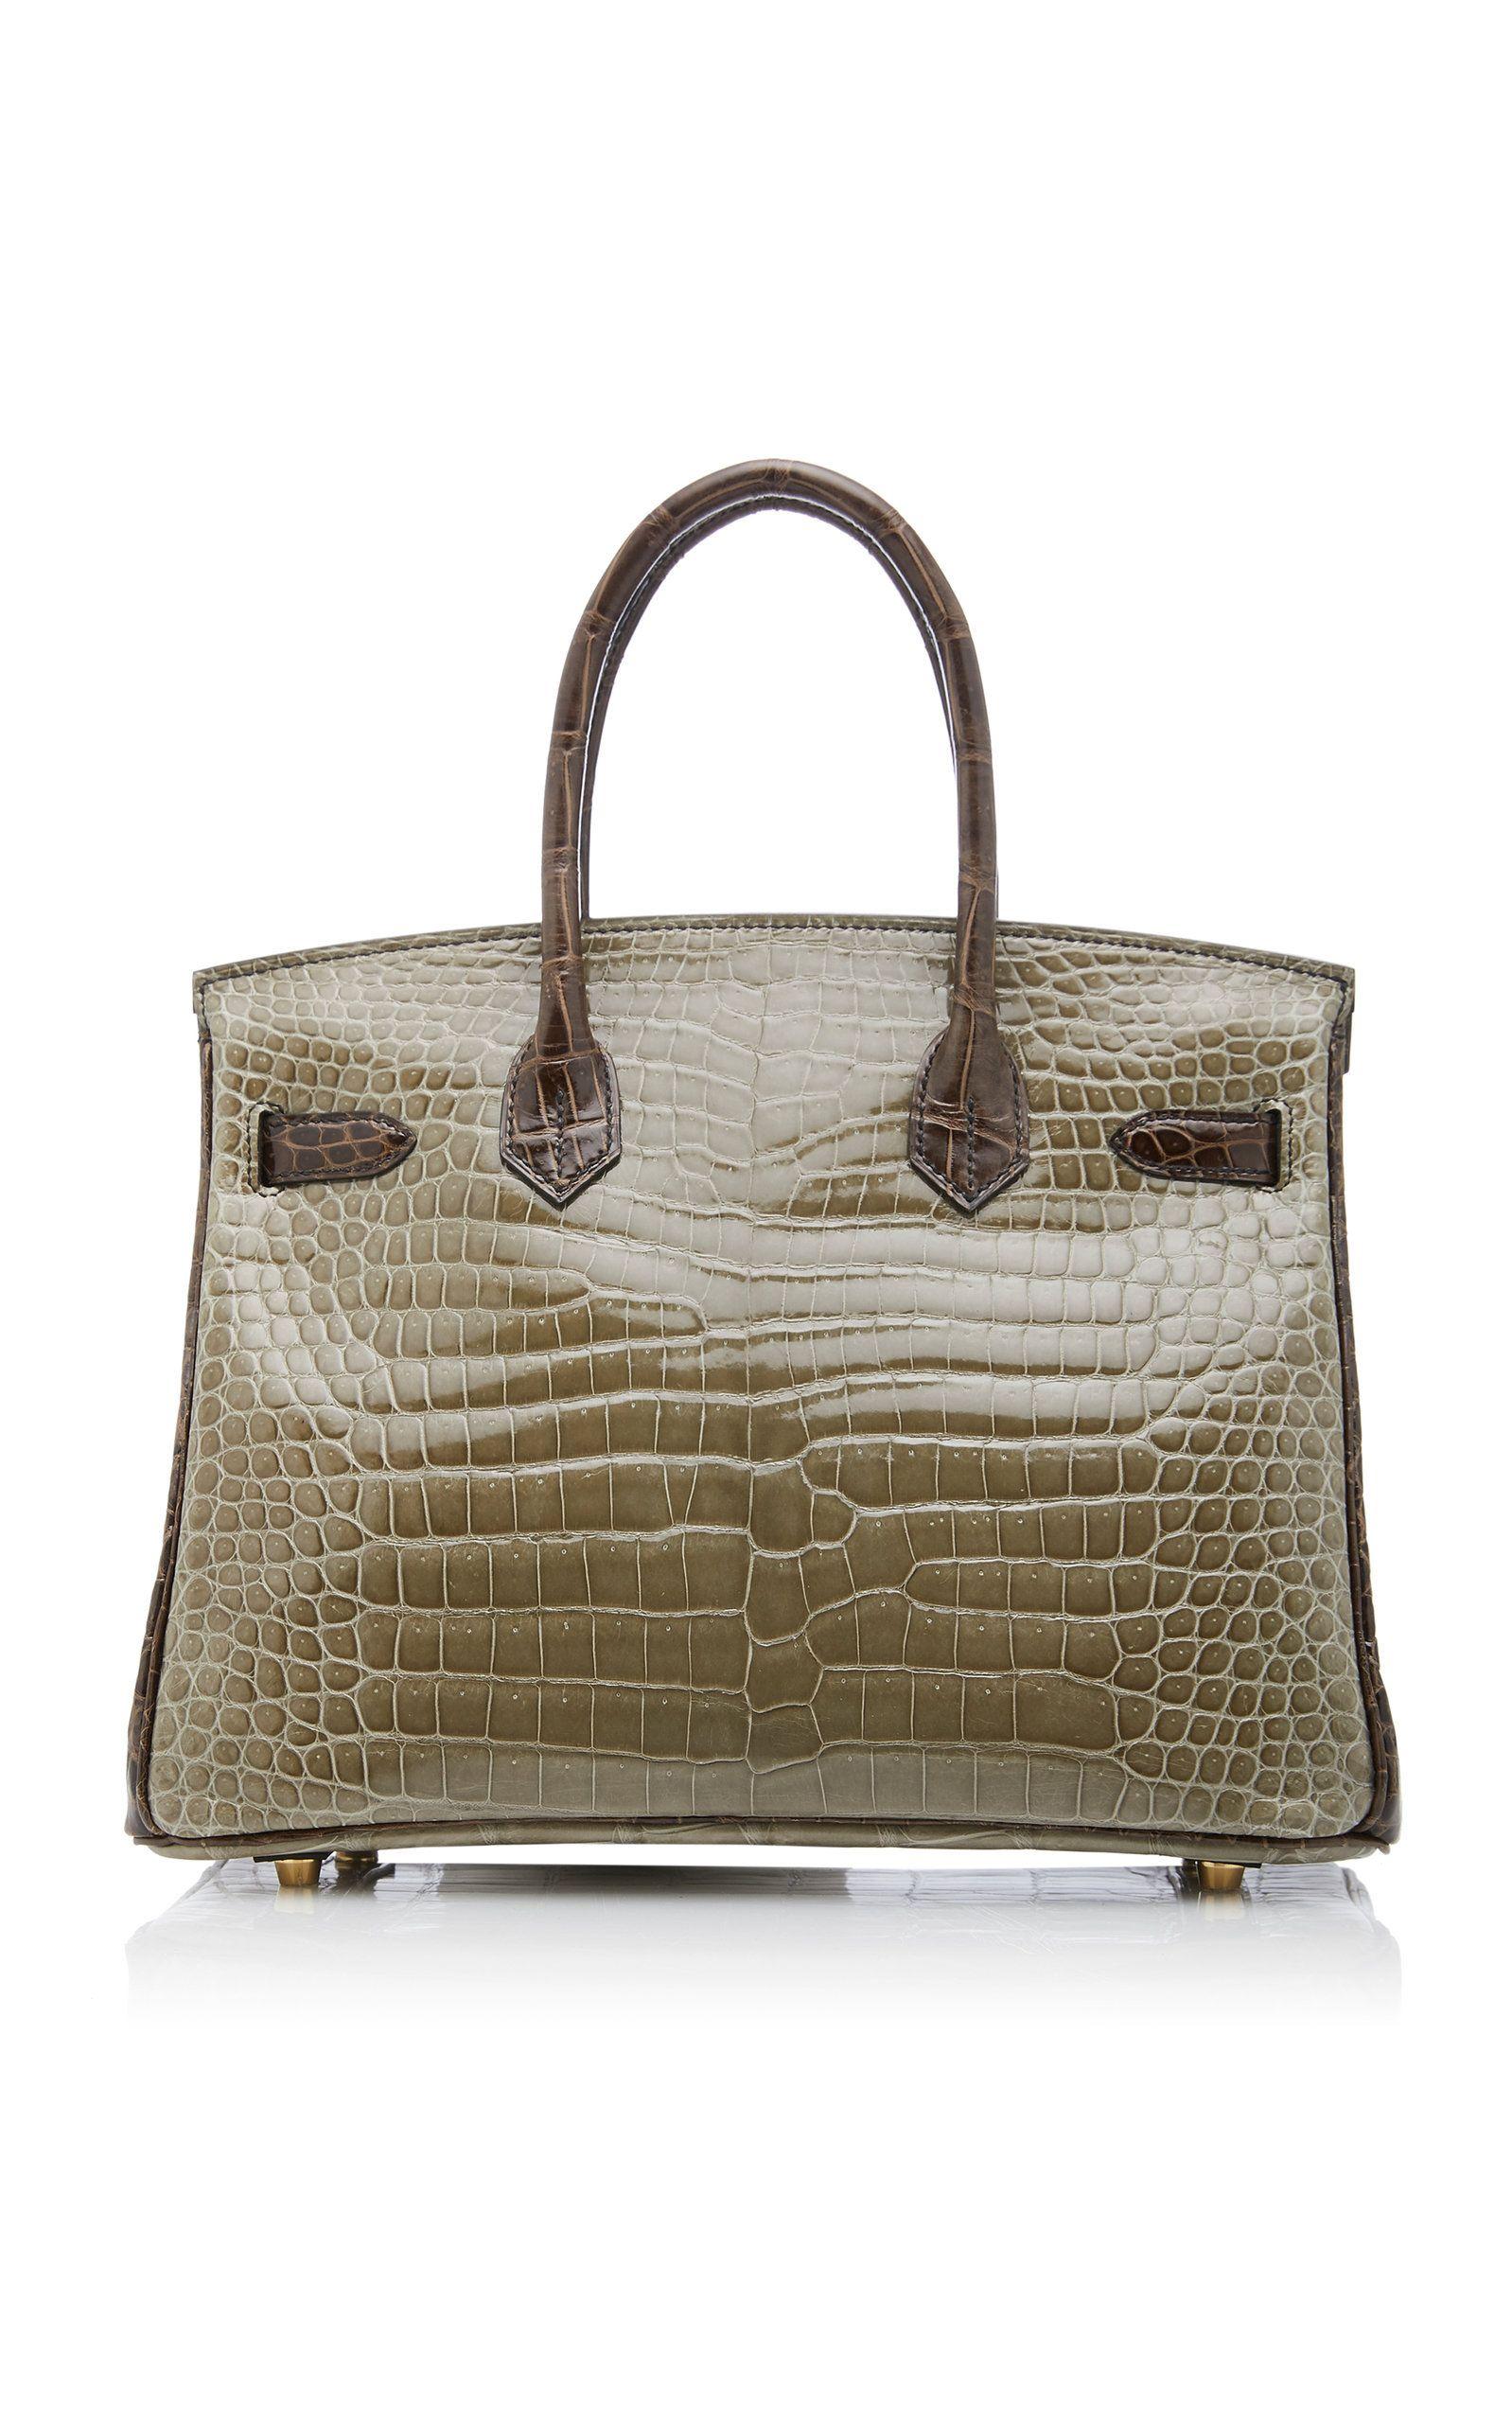 dbba4ccba81f Hermès 30cm Gris Elephant and Gris Tourterelle Crocodile Birkin